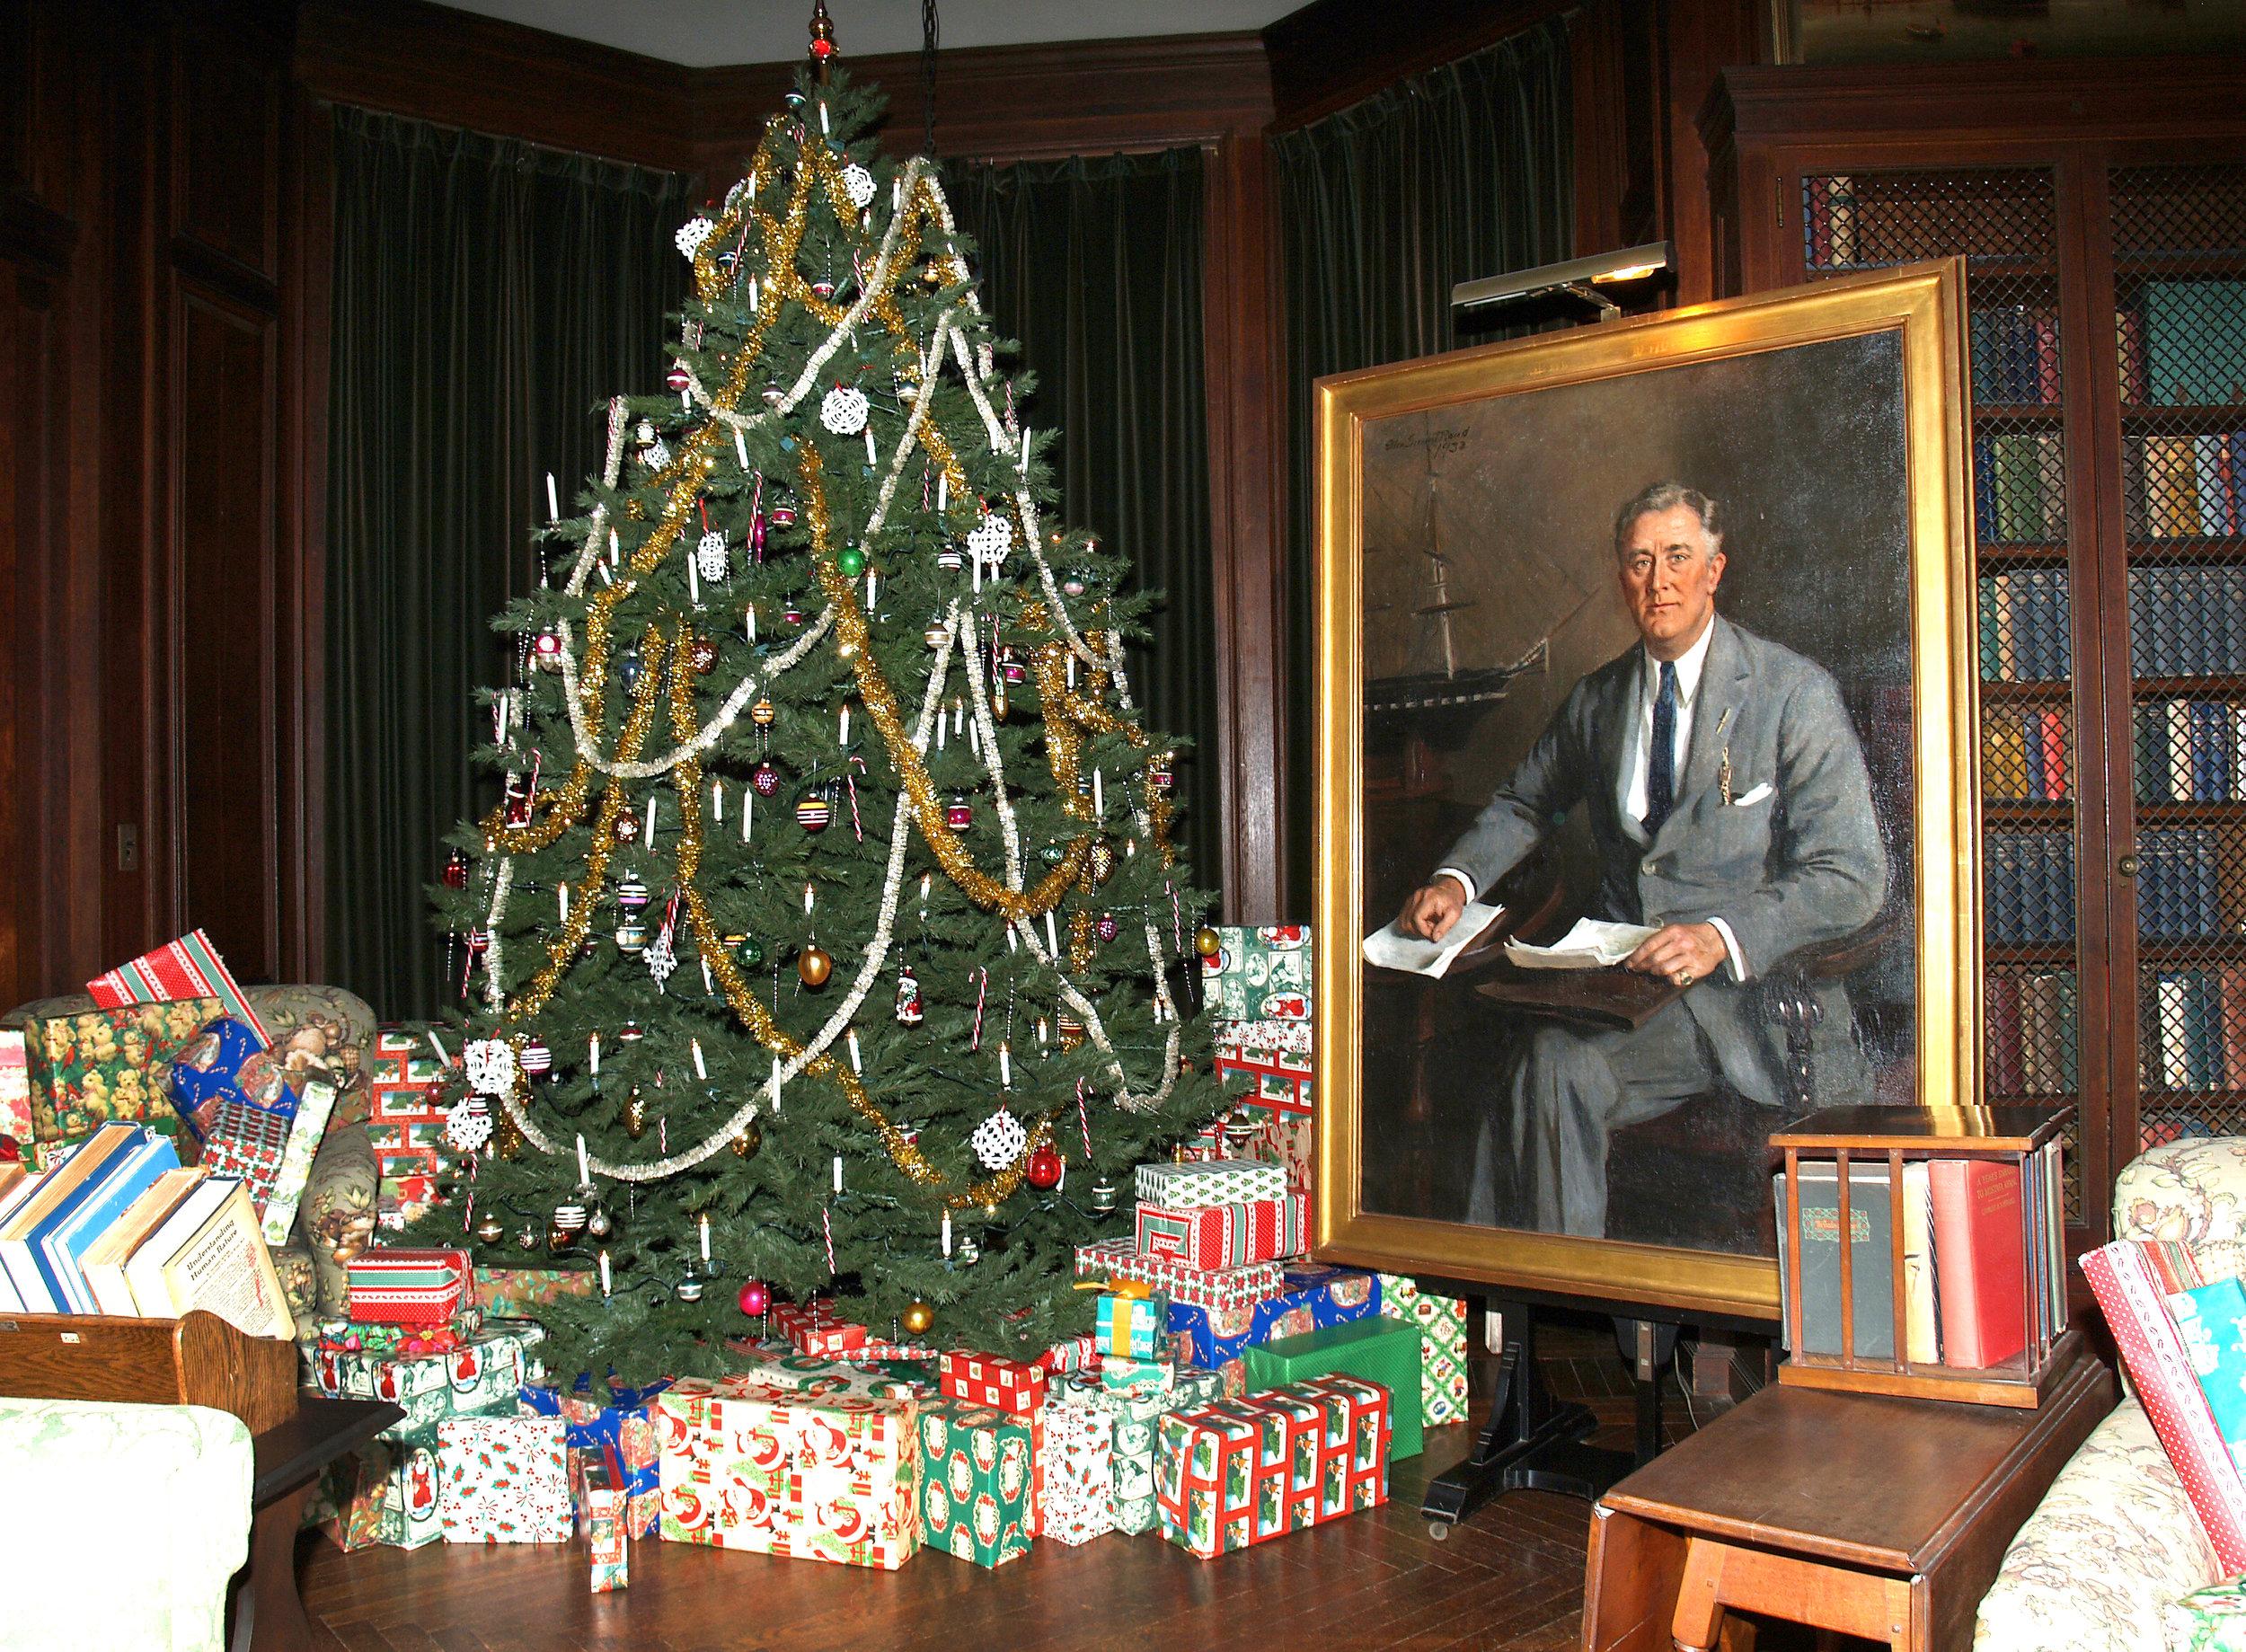 03. Home of Franklin D. roosevelt NHS Christmas Photo WD Urbin.jpg